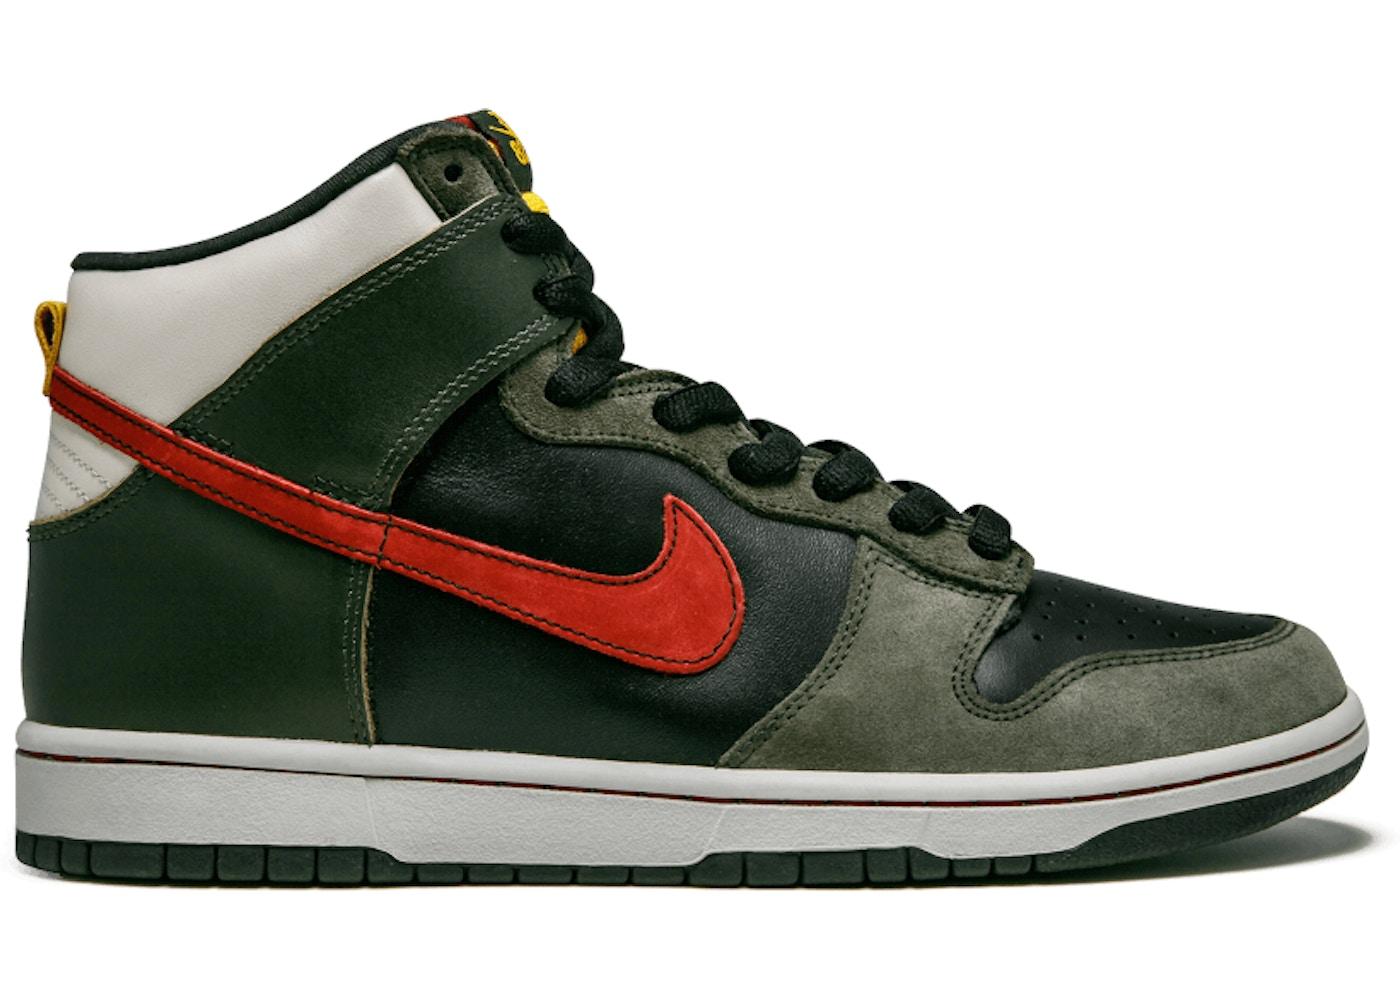 size 40 cfb6e 94e4e Buy Nike SB SB Dunk Low Shoes  Deadstock Sneakers